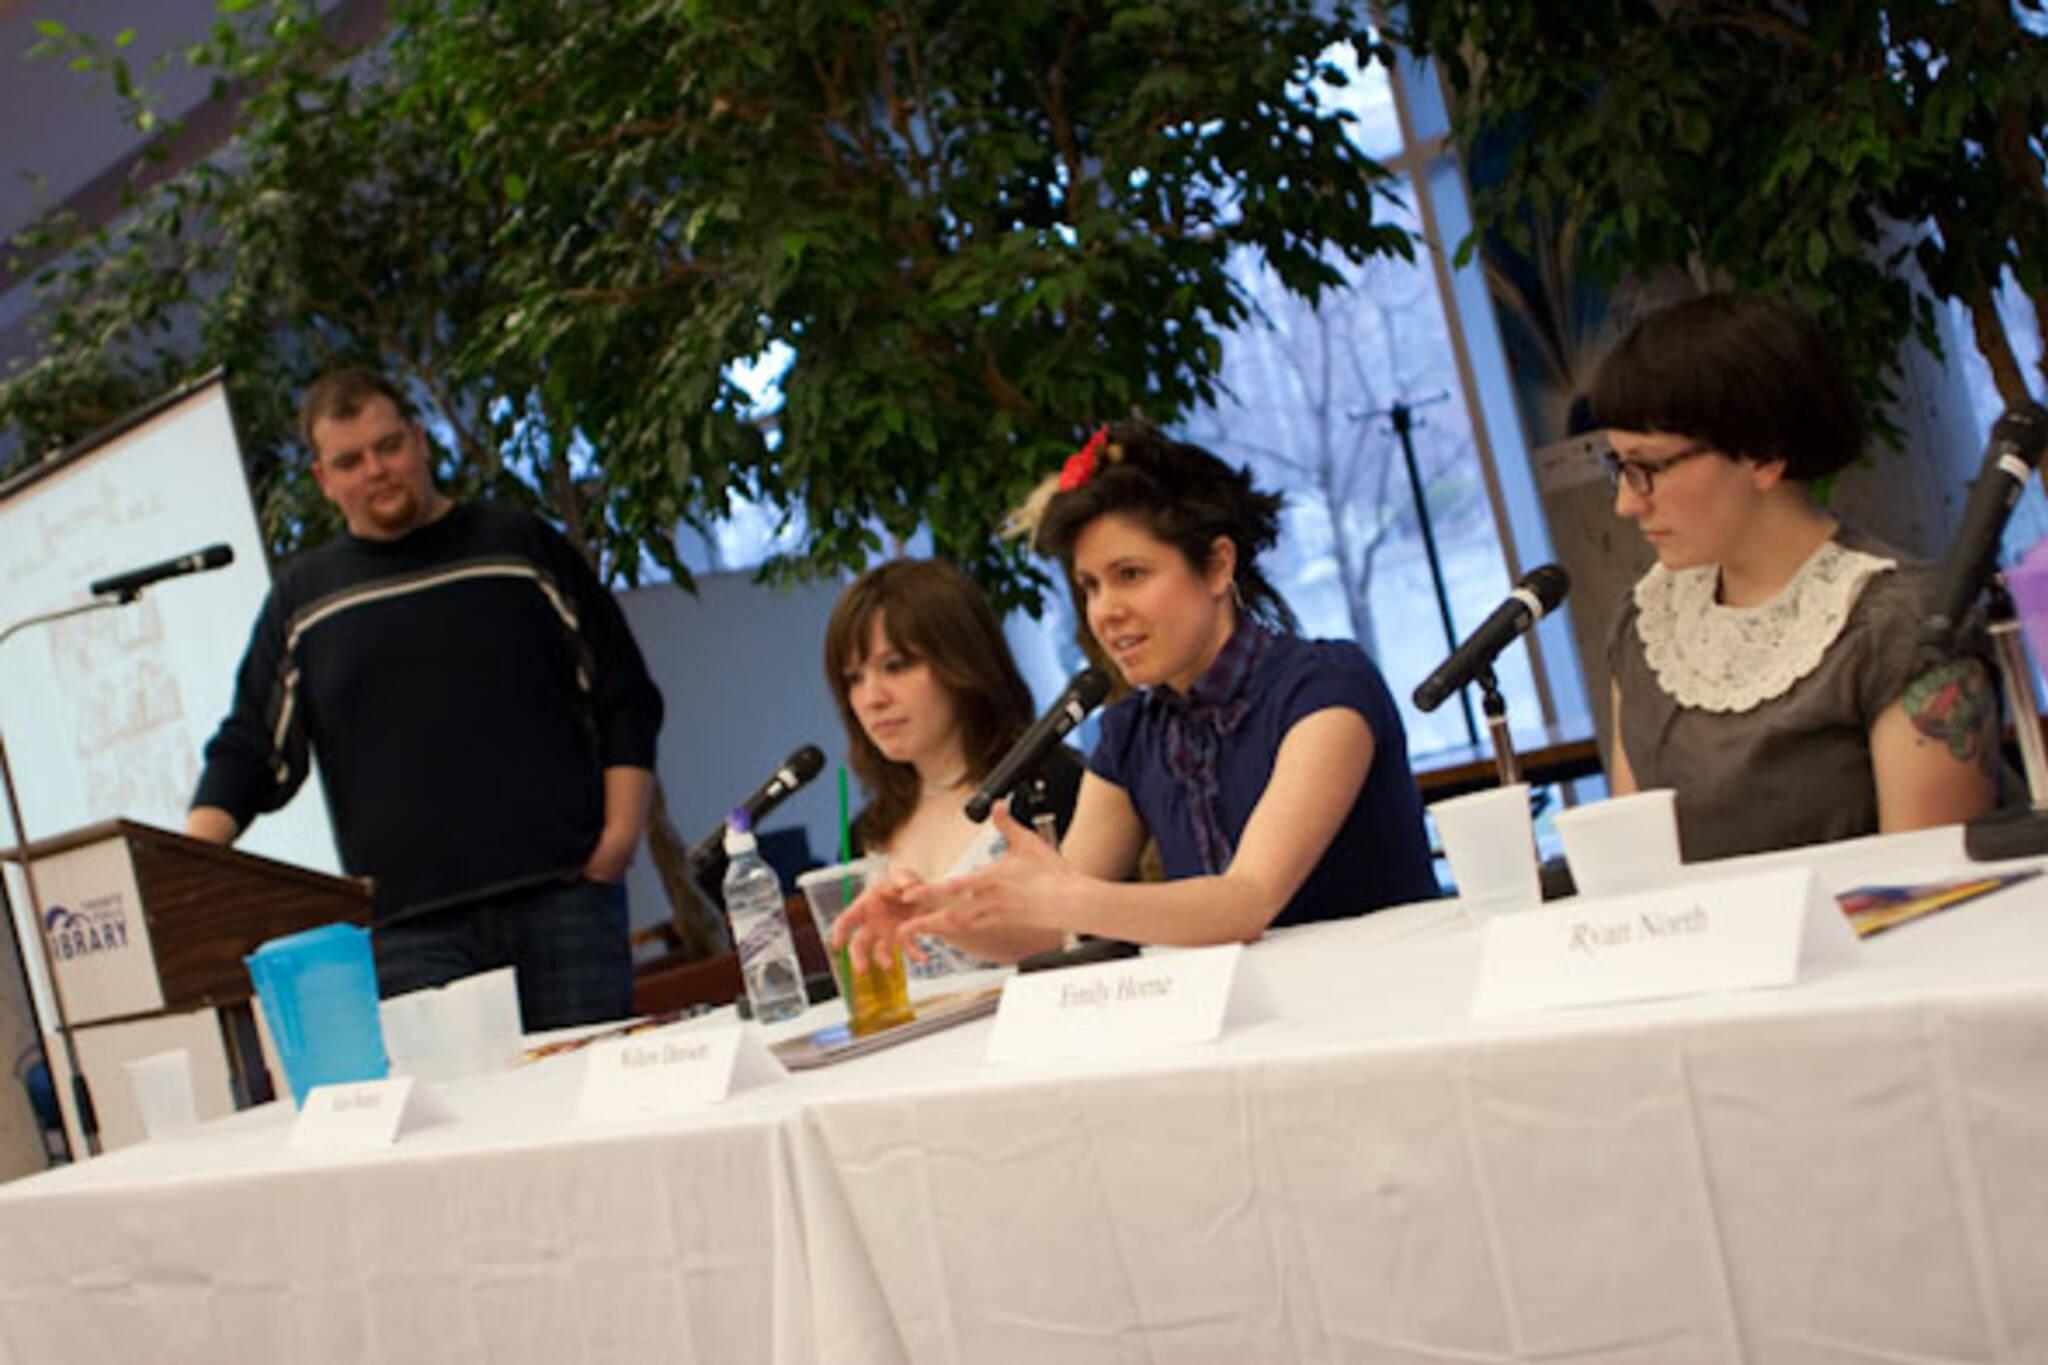 The Talking Webcomics Panel